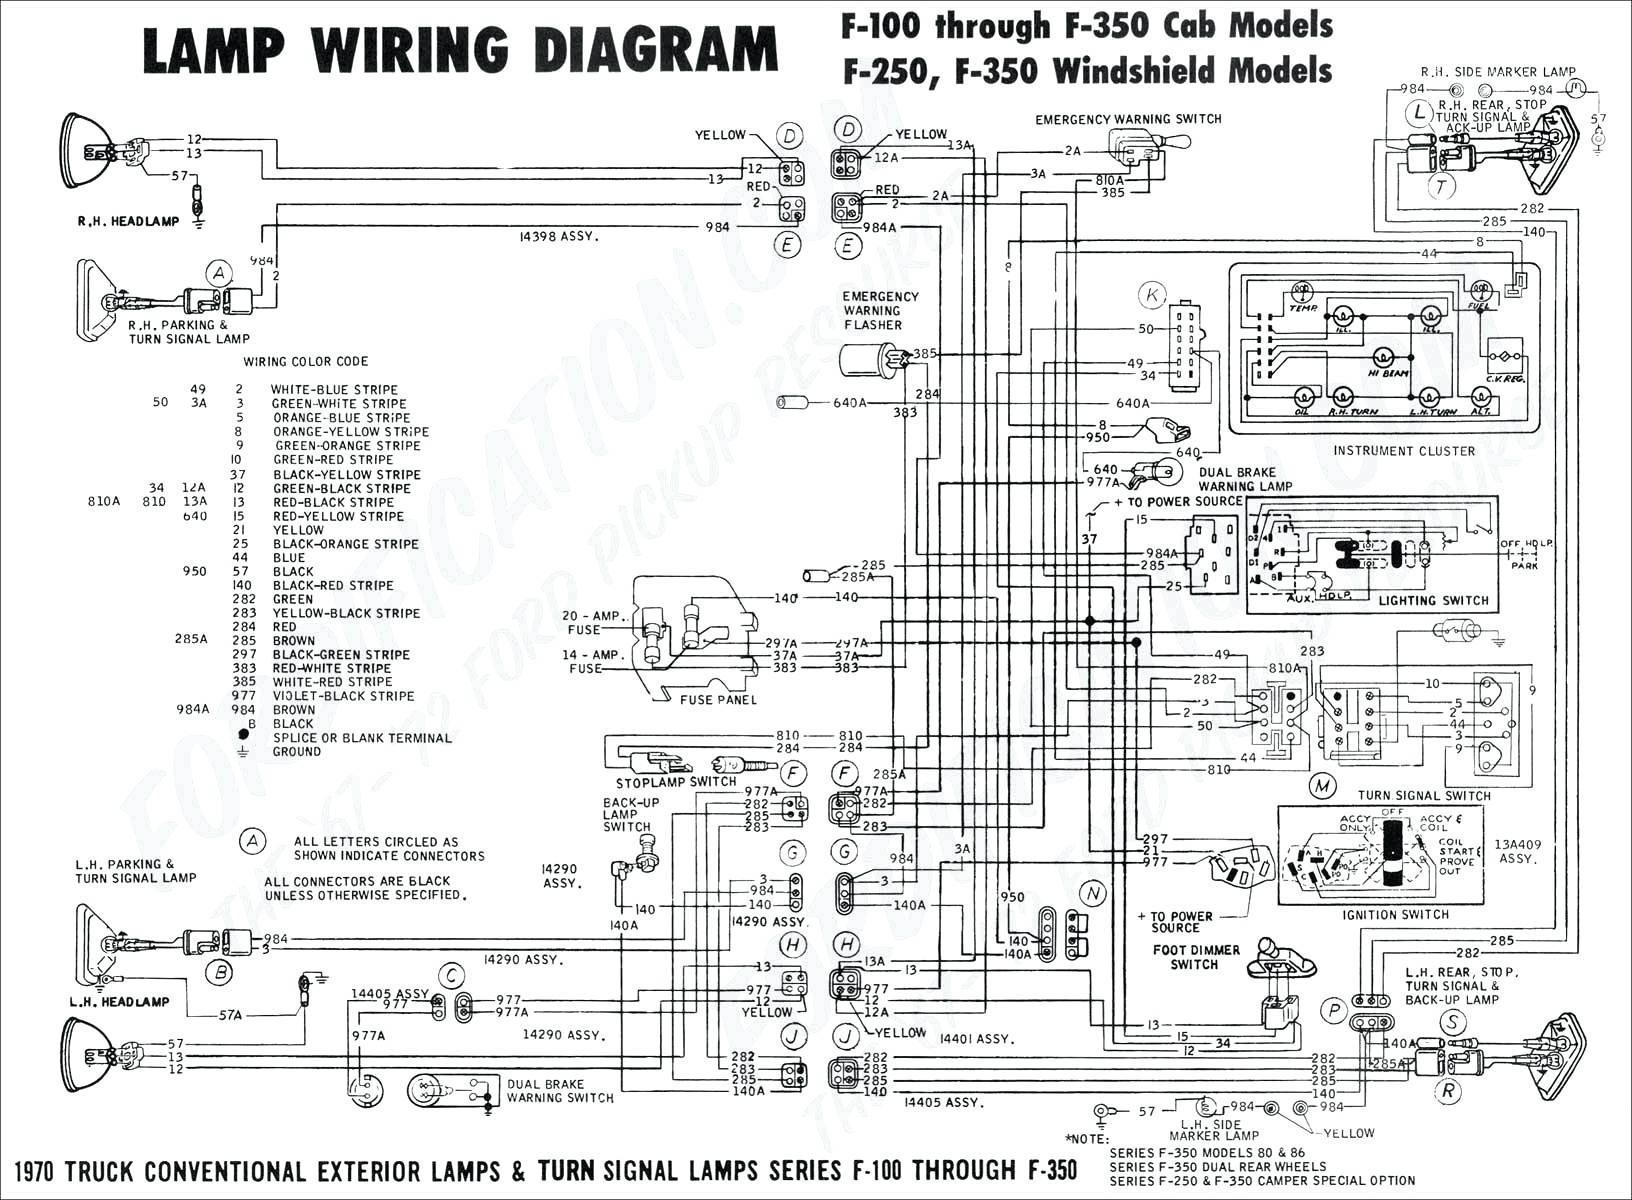 Diagram Of Car Charging System Wiring Diagram Car Charging System Inspirational Wiring Diagram Of Diagram Of Car Charging System